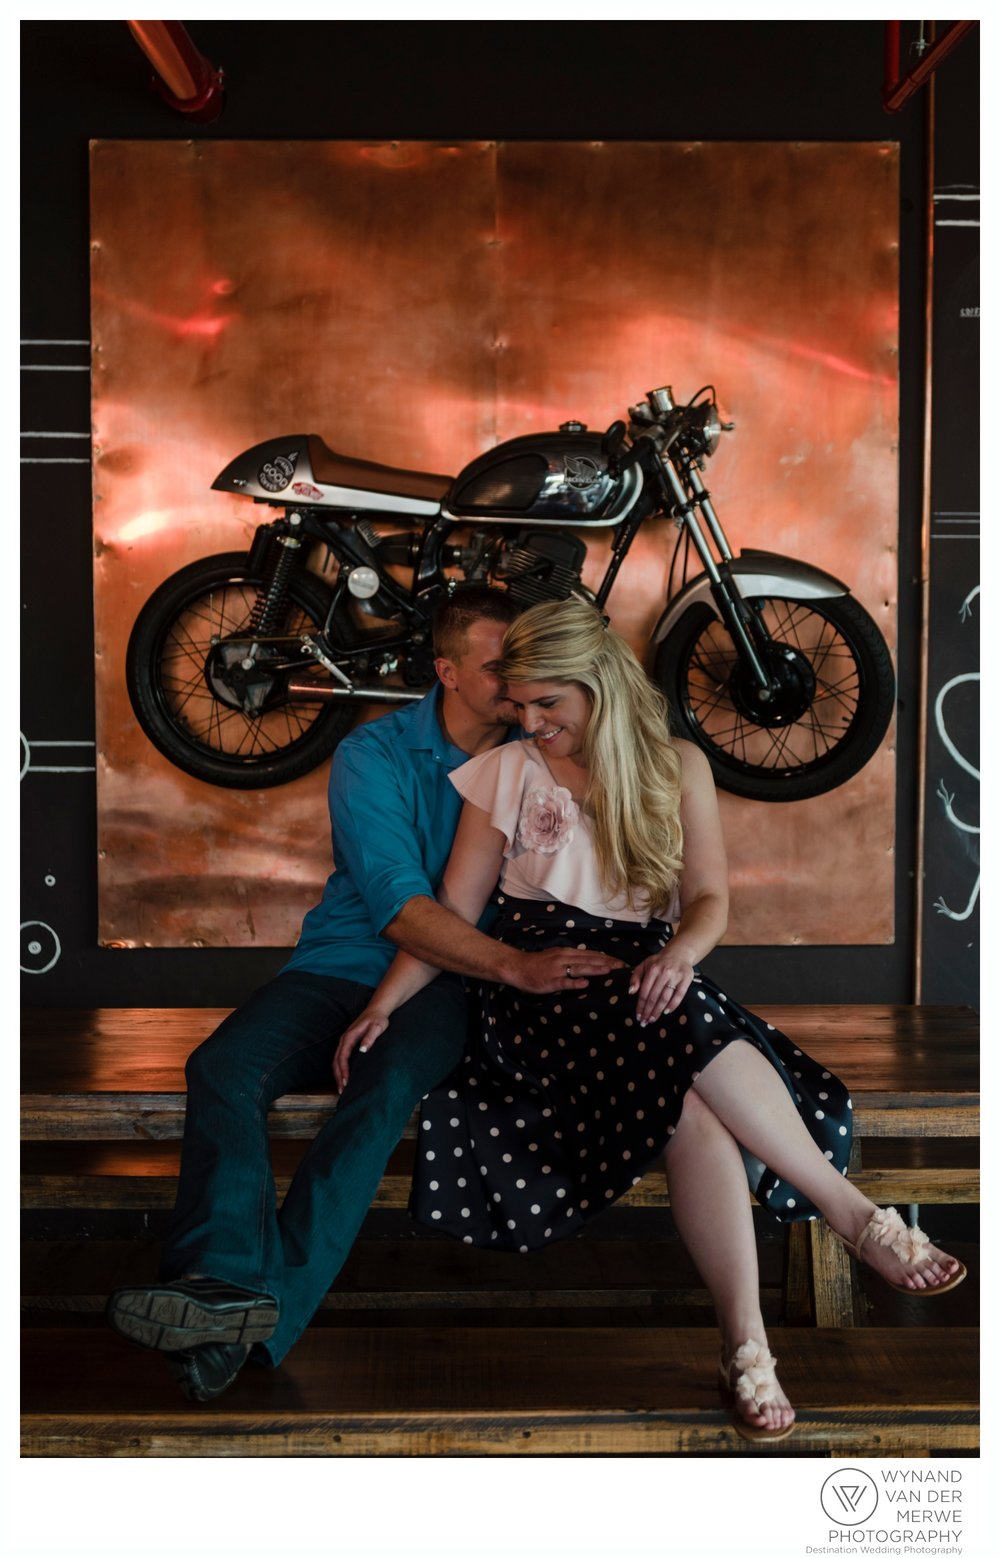 WynandvanderMerwe_weddingphotography_engagementshoot_icoffeeworks_industrial_romandityronne_gauteng_2018-18.jpg